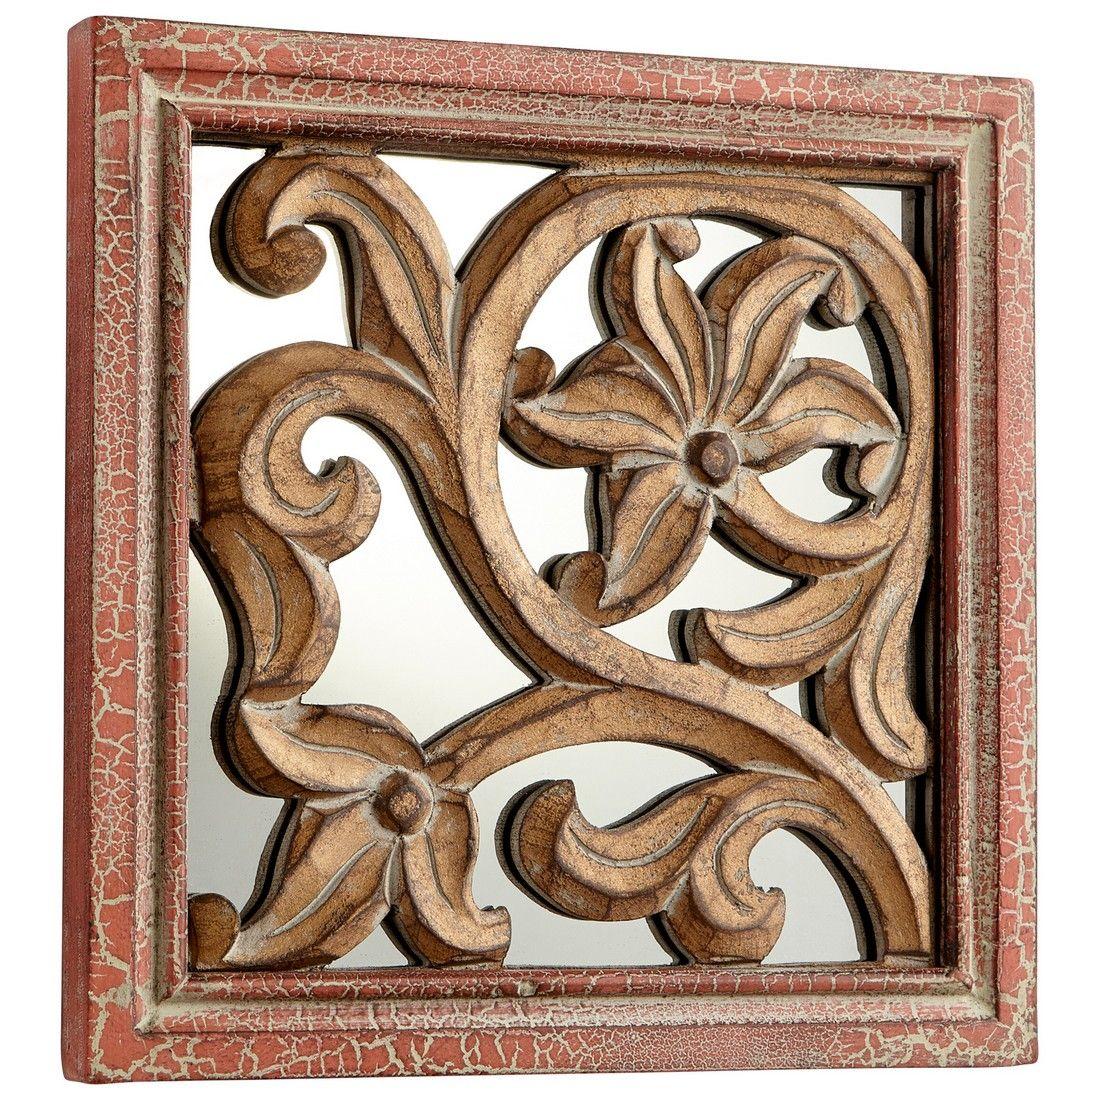 Cyan Design Vague 10 Mirrored Glass Wall Art In Antique Cherry